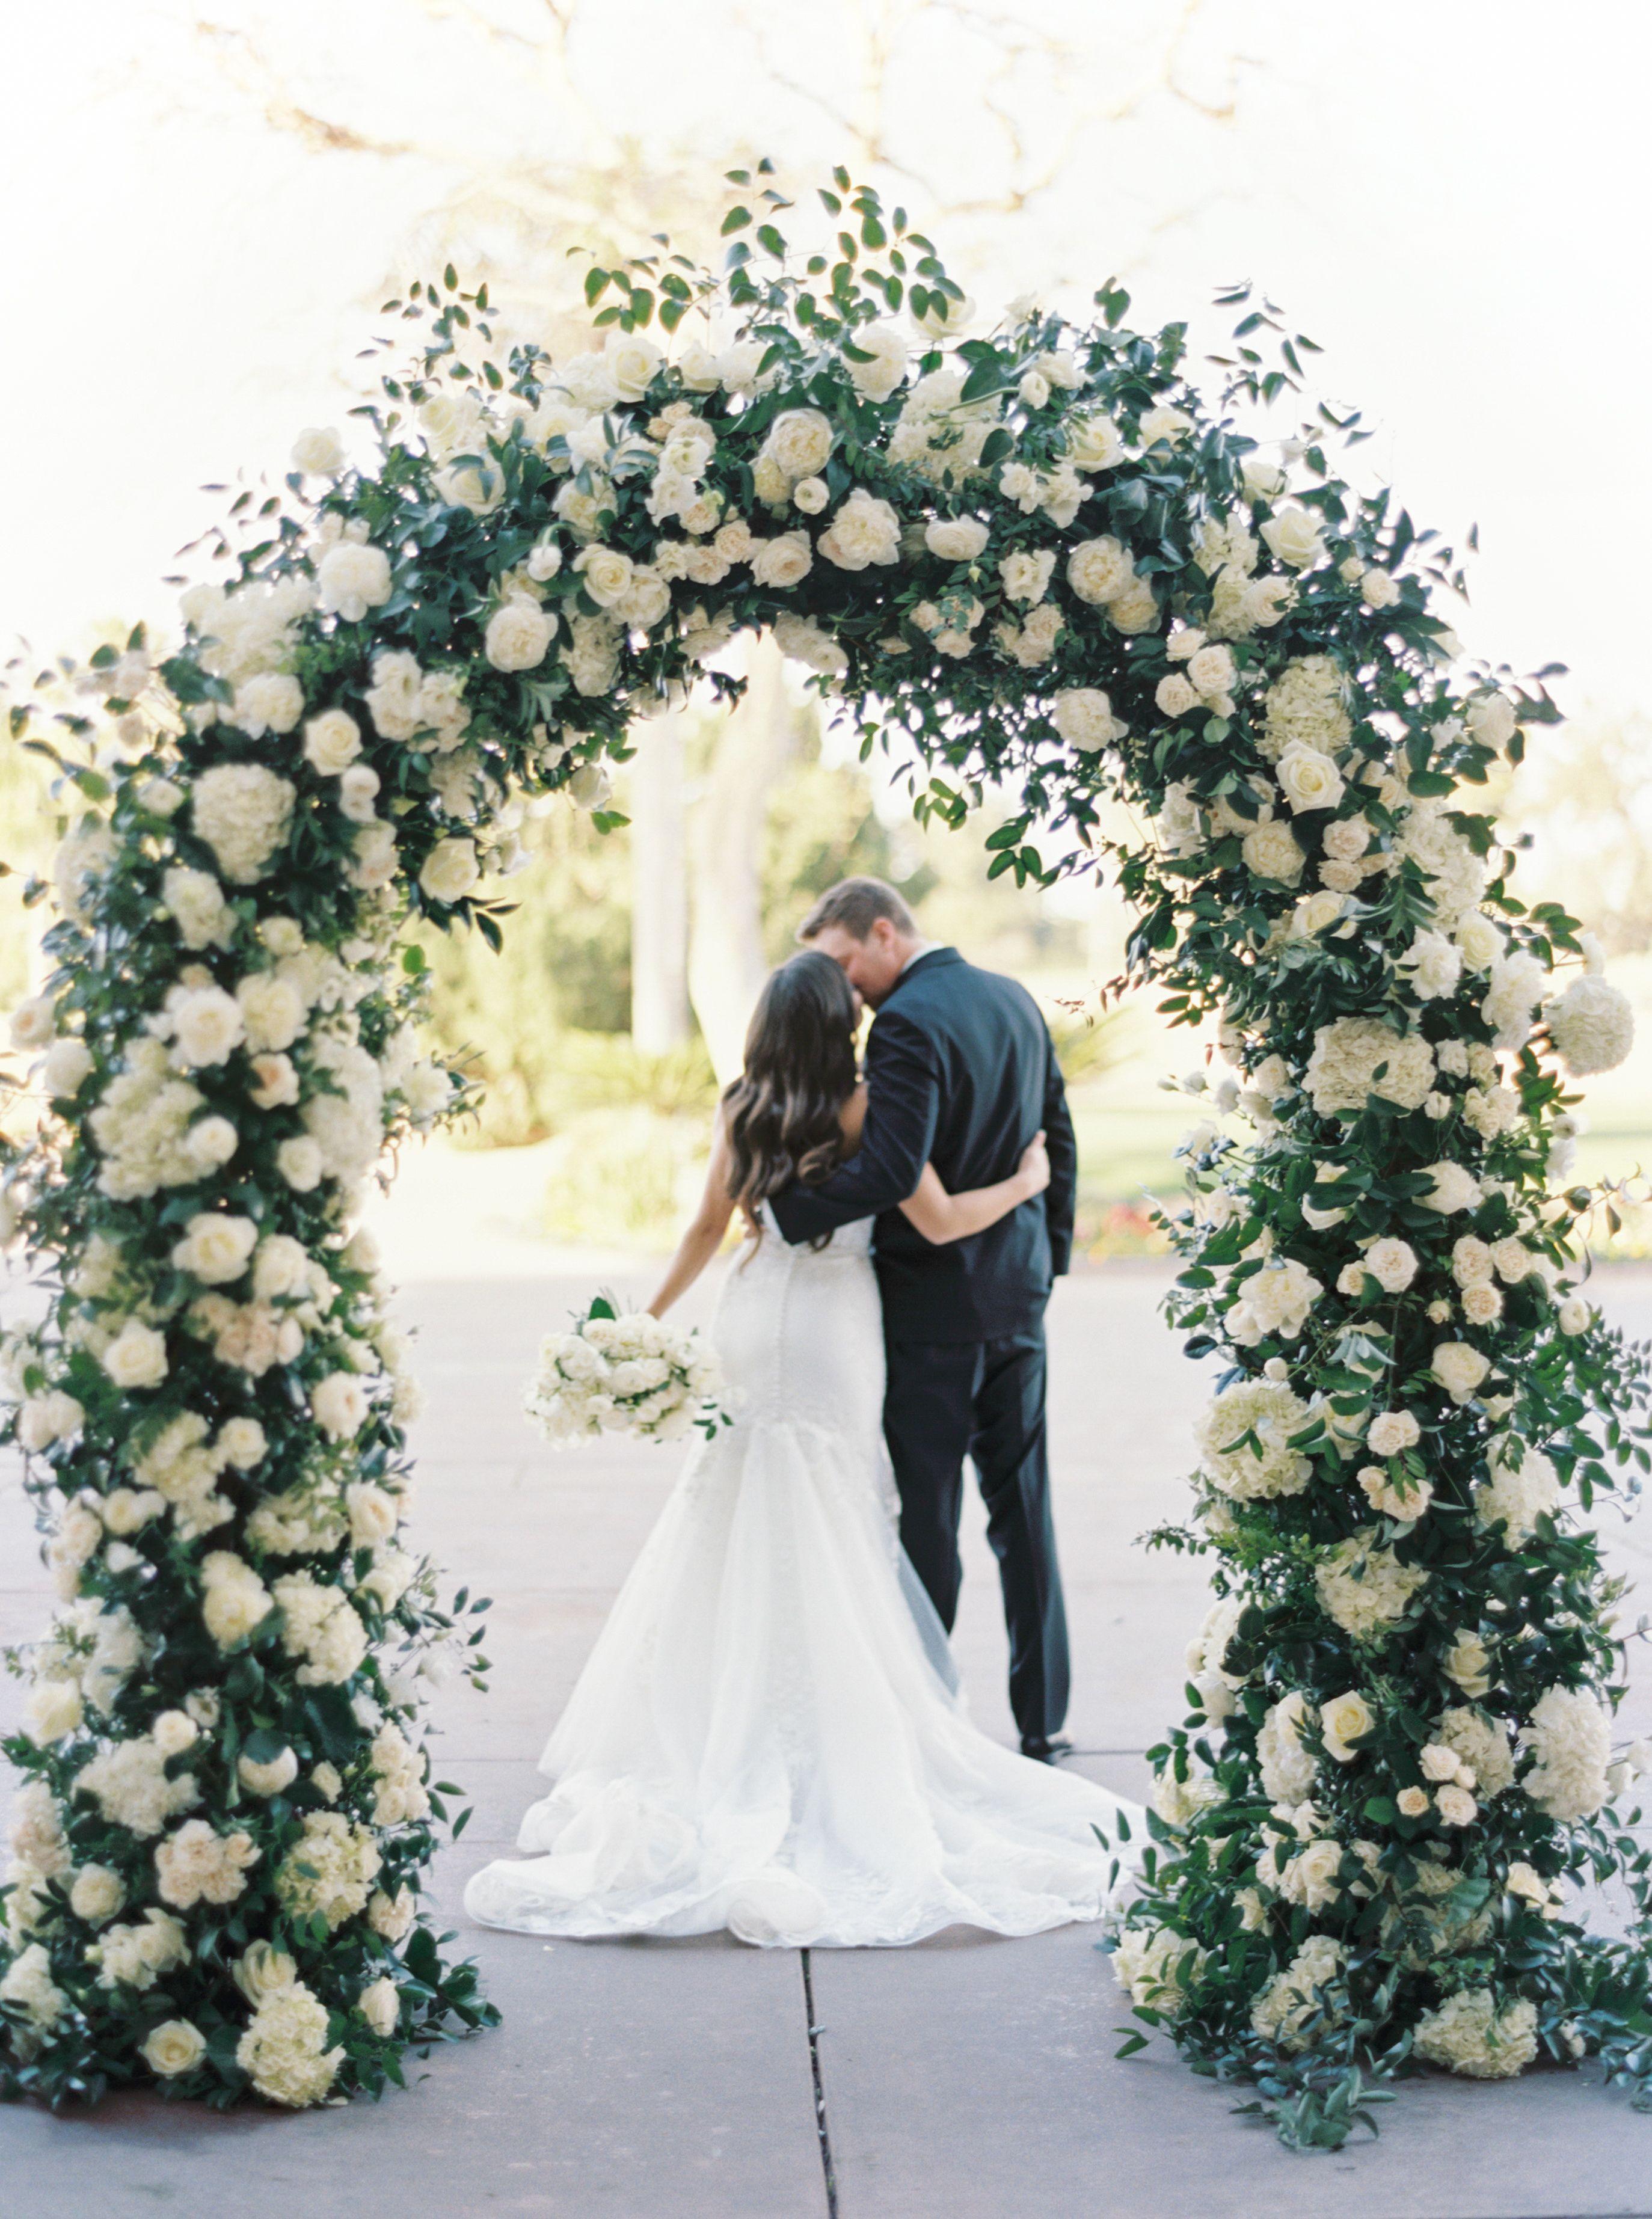 Wedding Ceremony White Rose Arbor In 2020 Wedding Arch Flowers White Roses Wedding Wedding Flower Archway